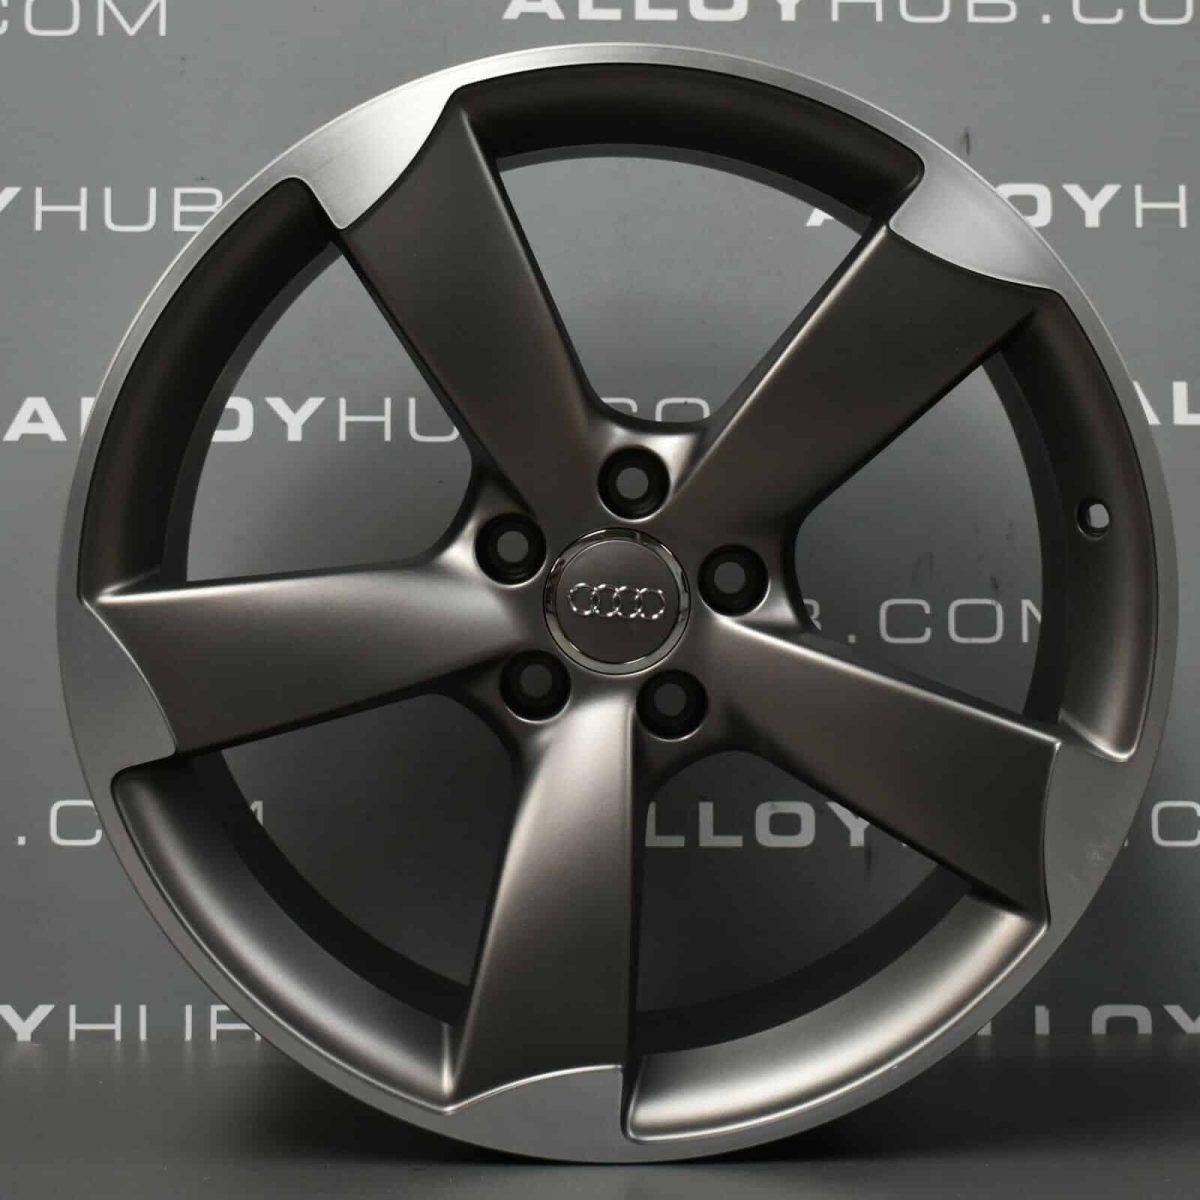 "Genuine Audi A4 8K 5 Spoke Rotor Arm 19"" Inch Alloy Wheels with Grey & Diamond Turned Finish 8K0 601 025 CN"